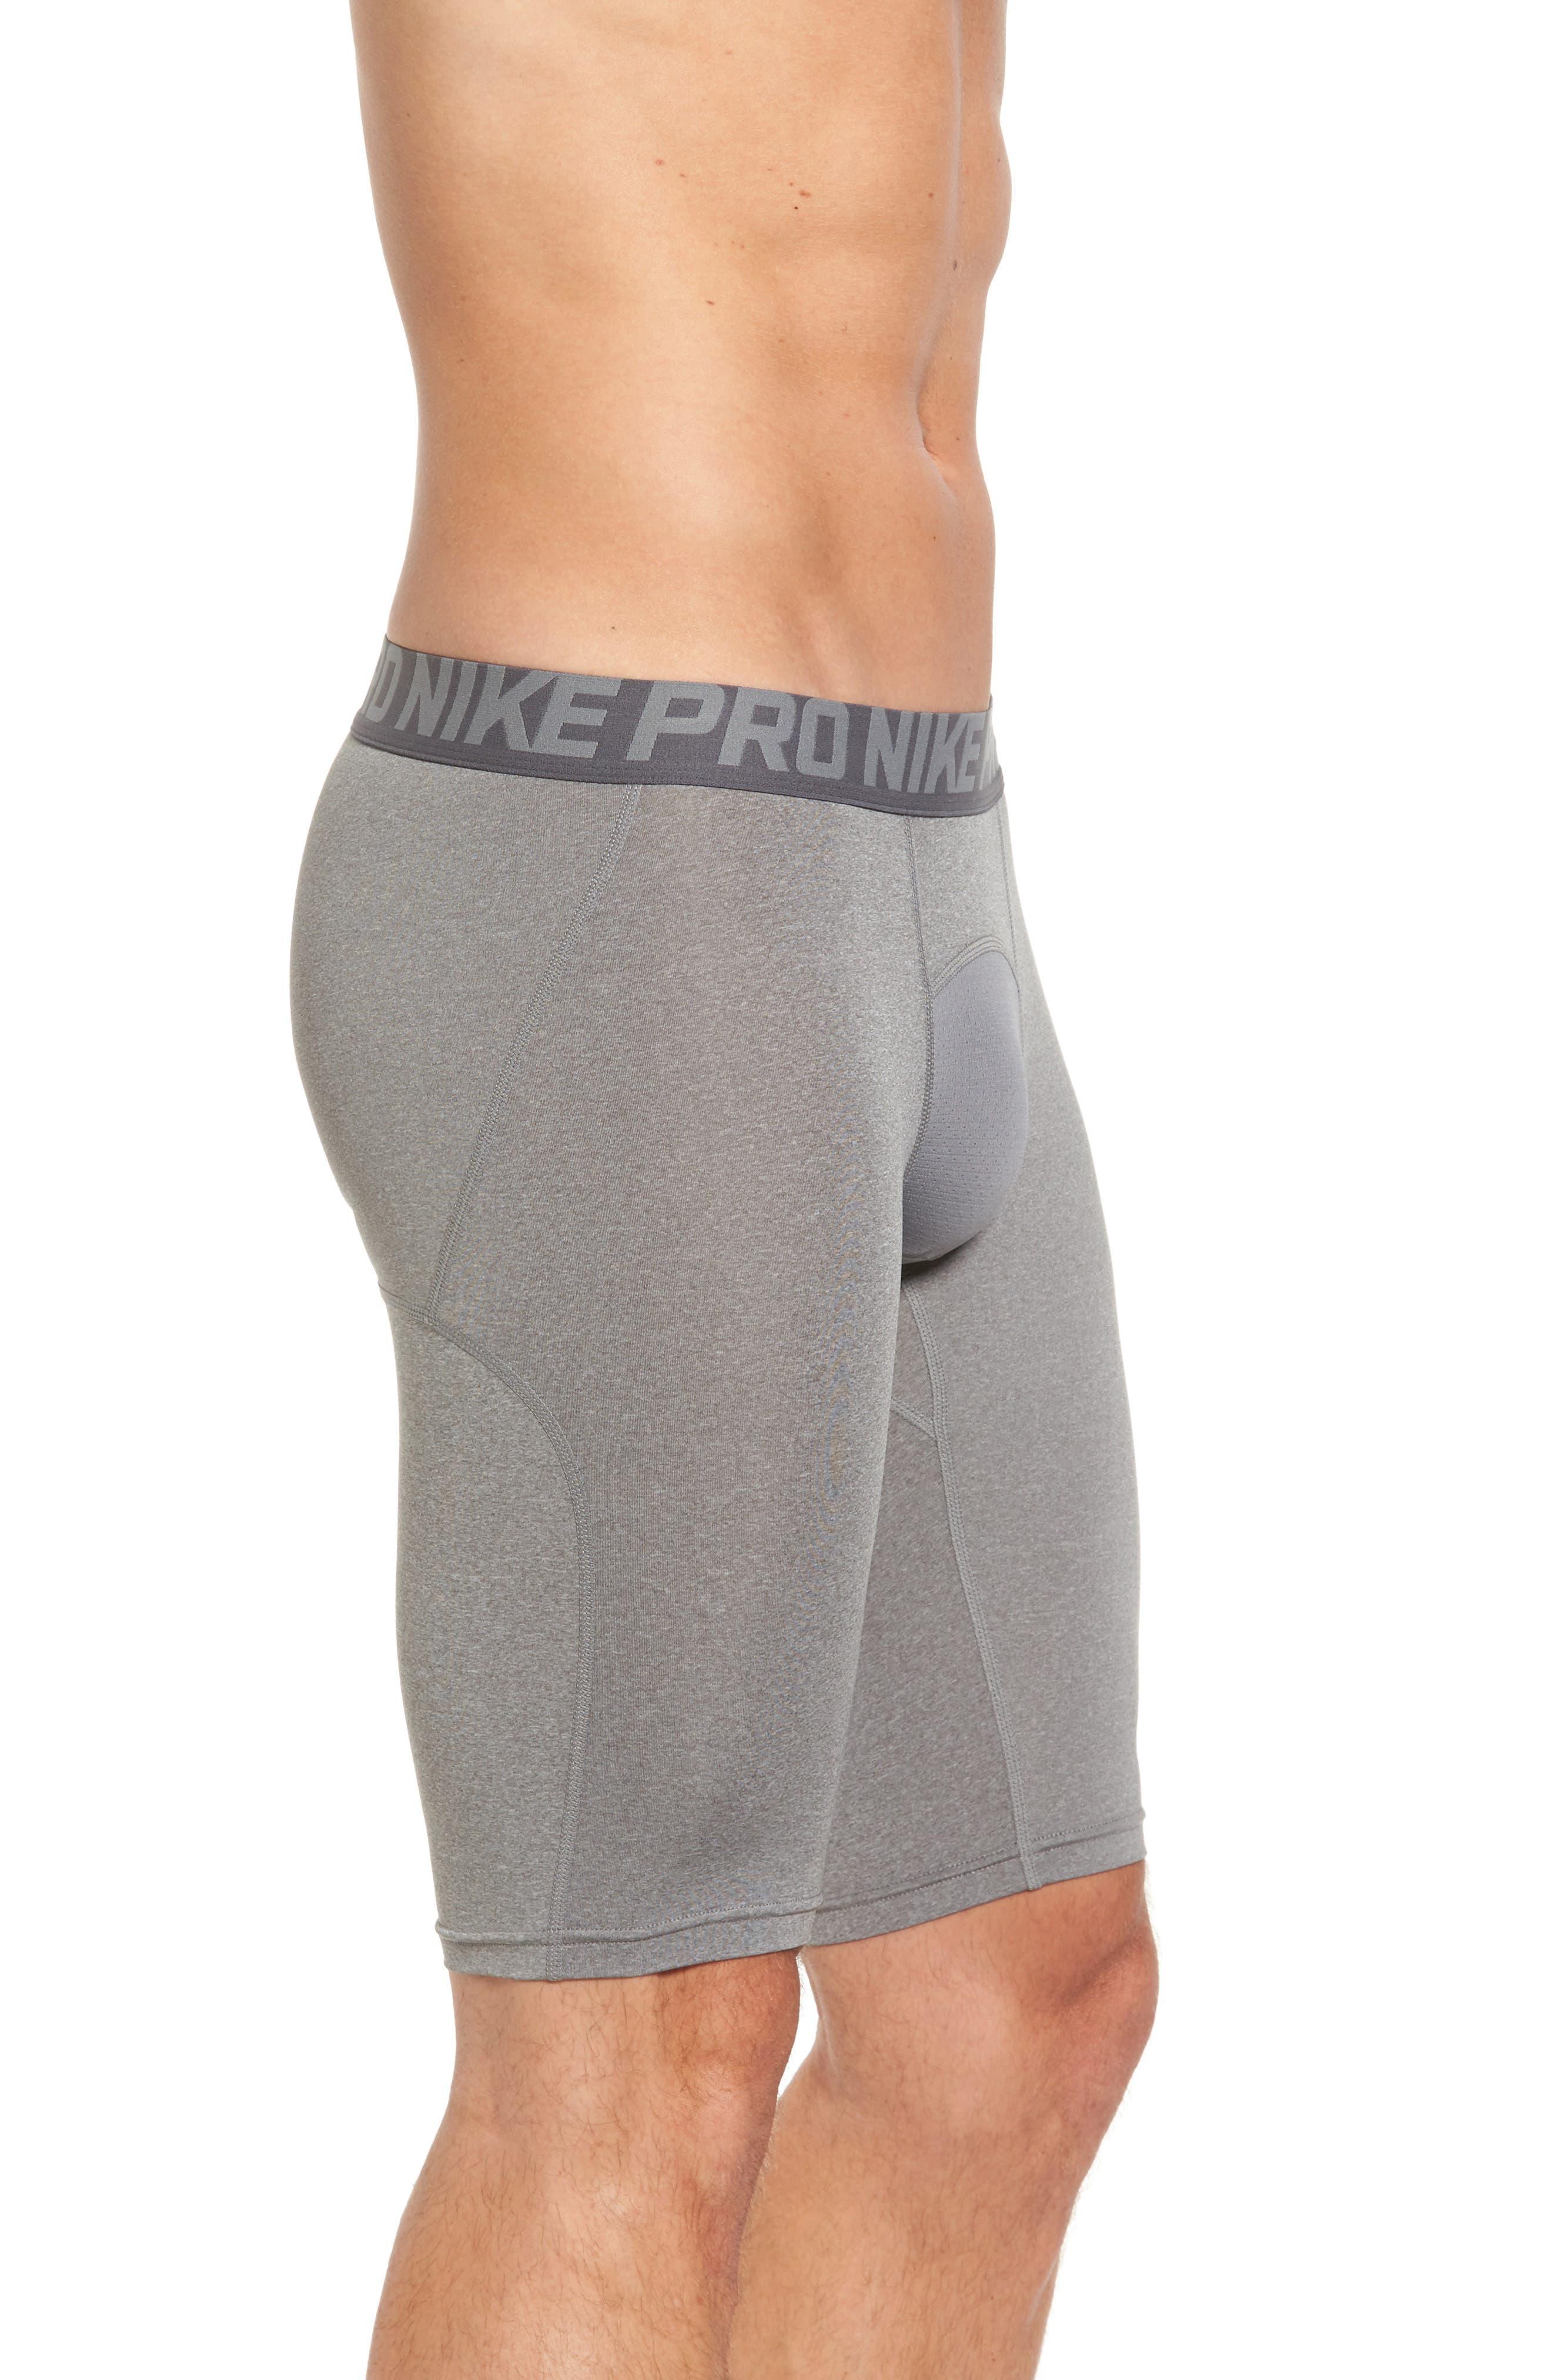 Pro Compression Shorts,                             Alternate thumbnail 8, color,